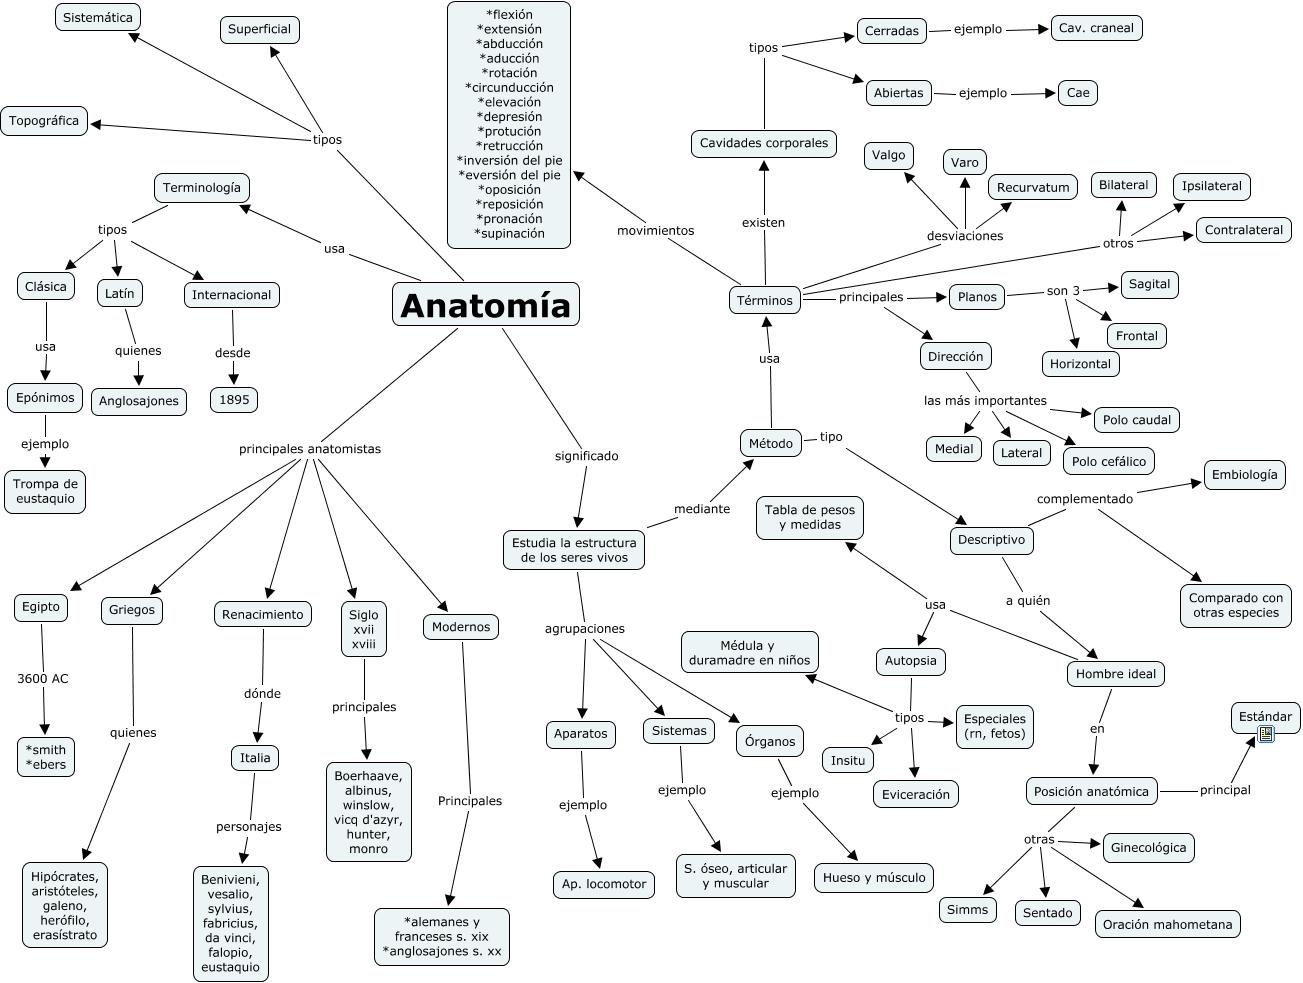 1. Anatomía